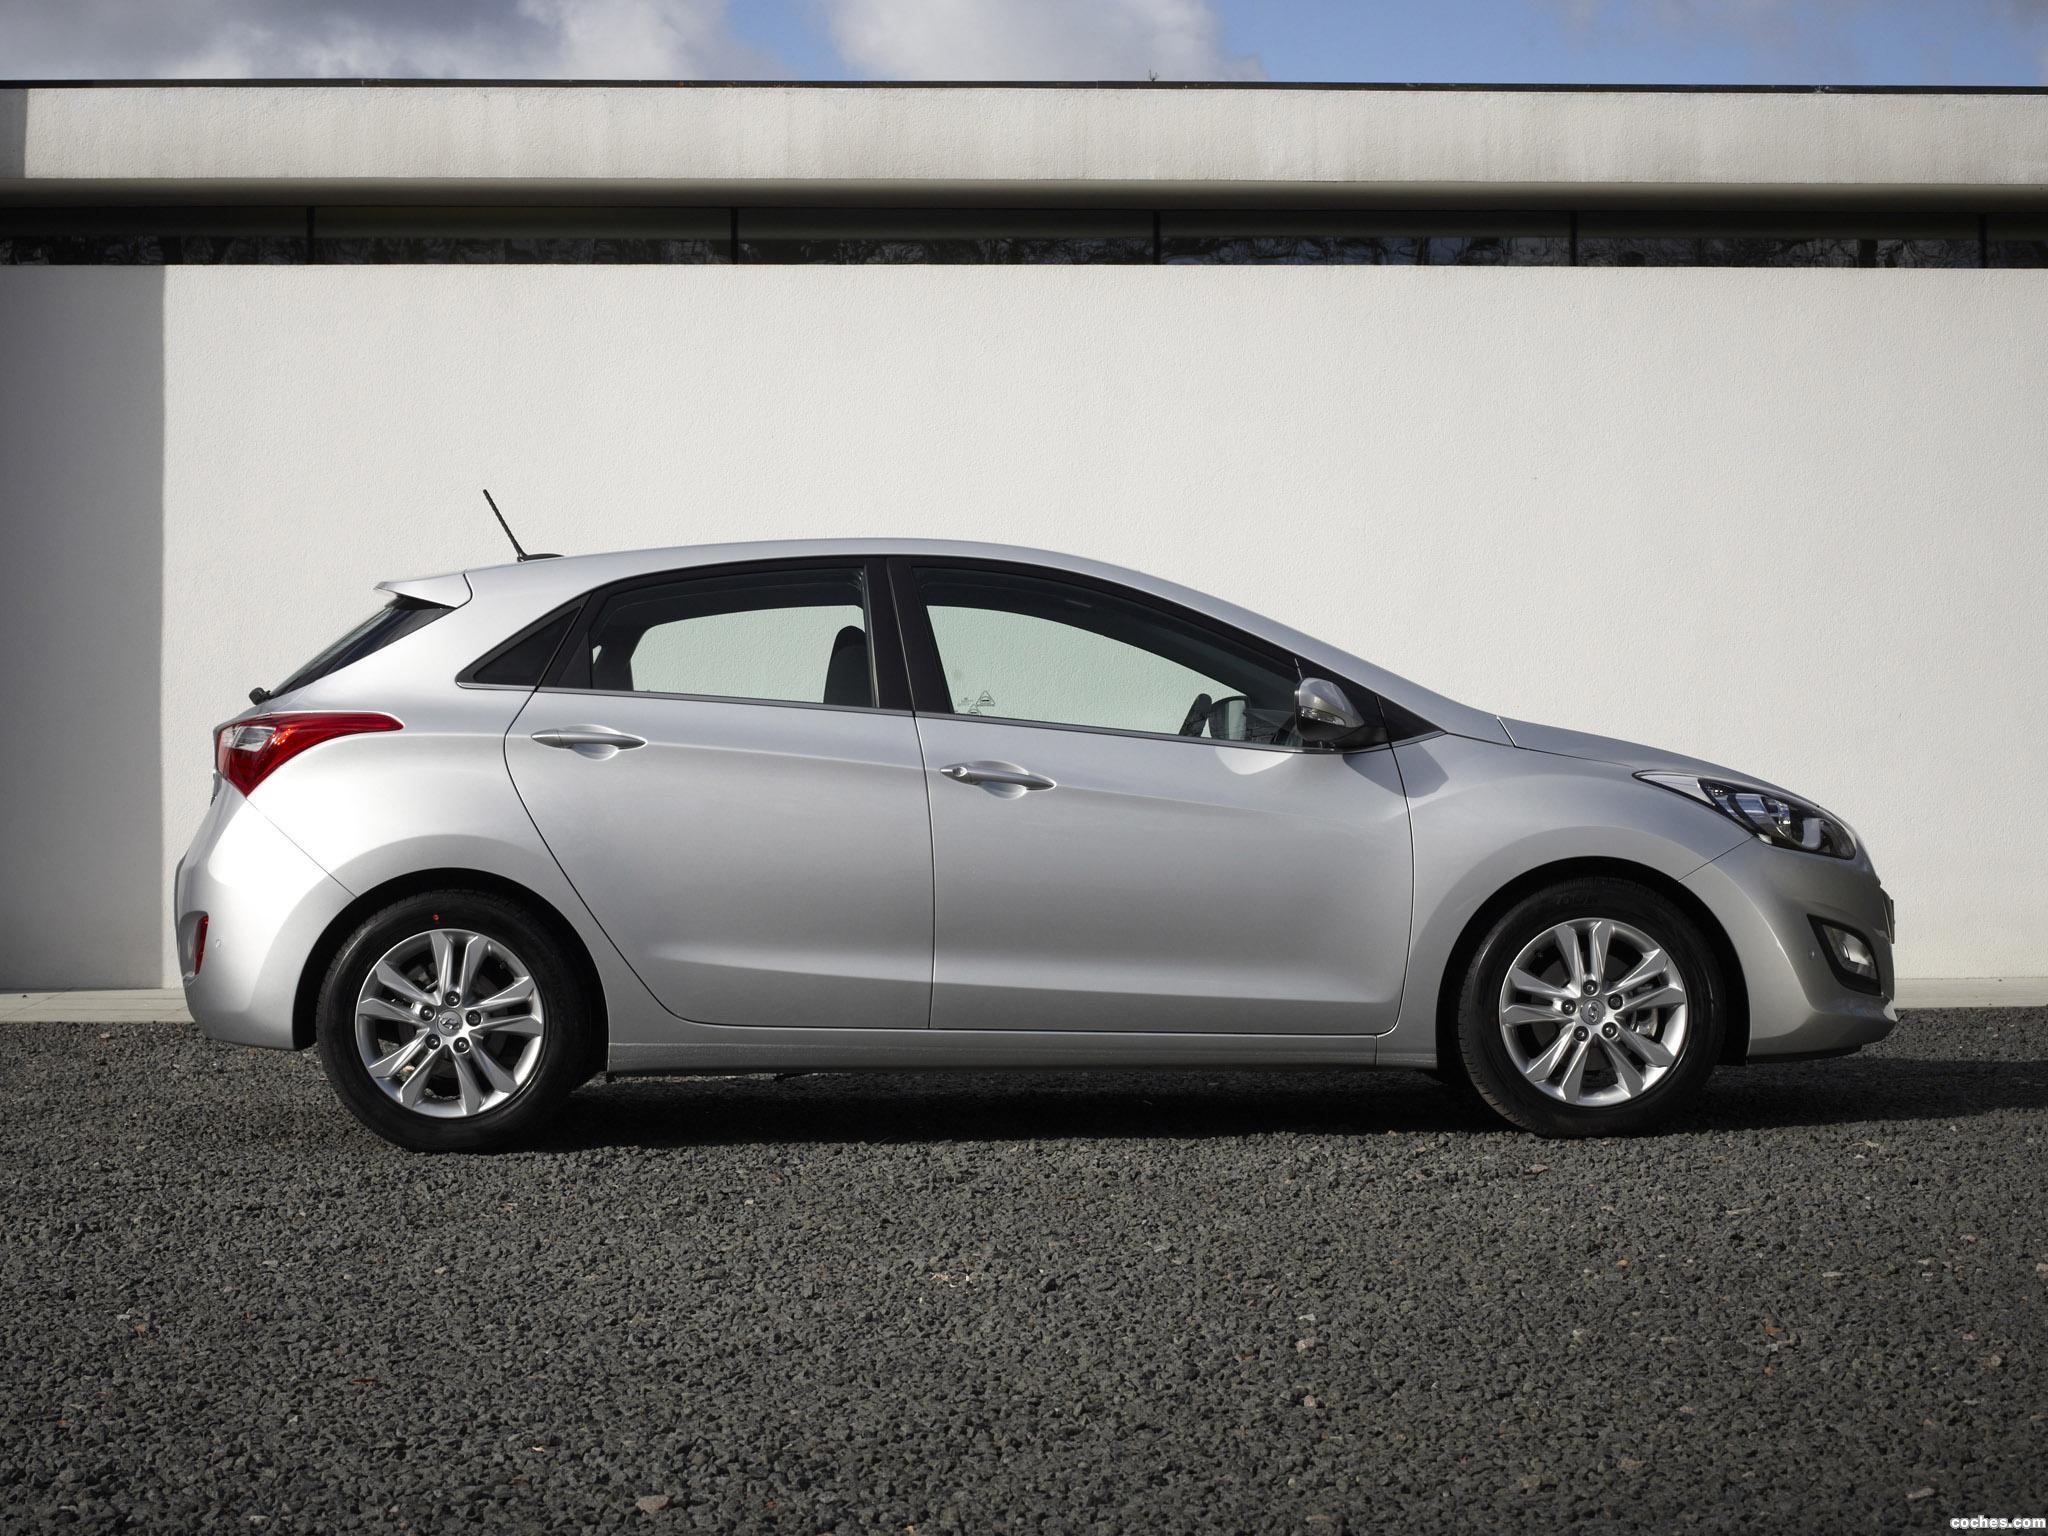 Foto 20 de Hyundai I30 UK 2012 5 puertas